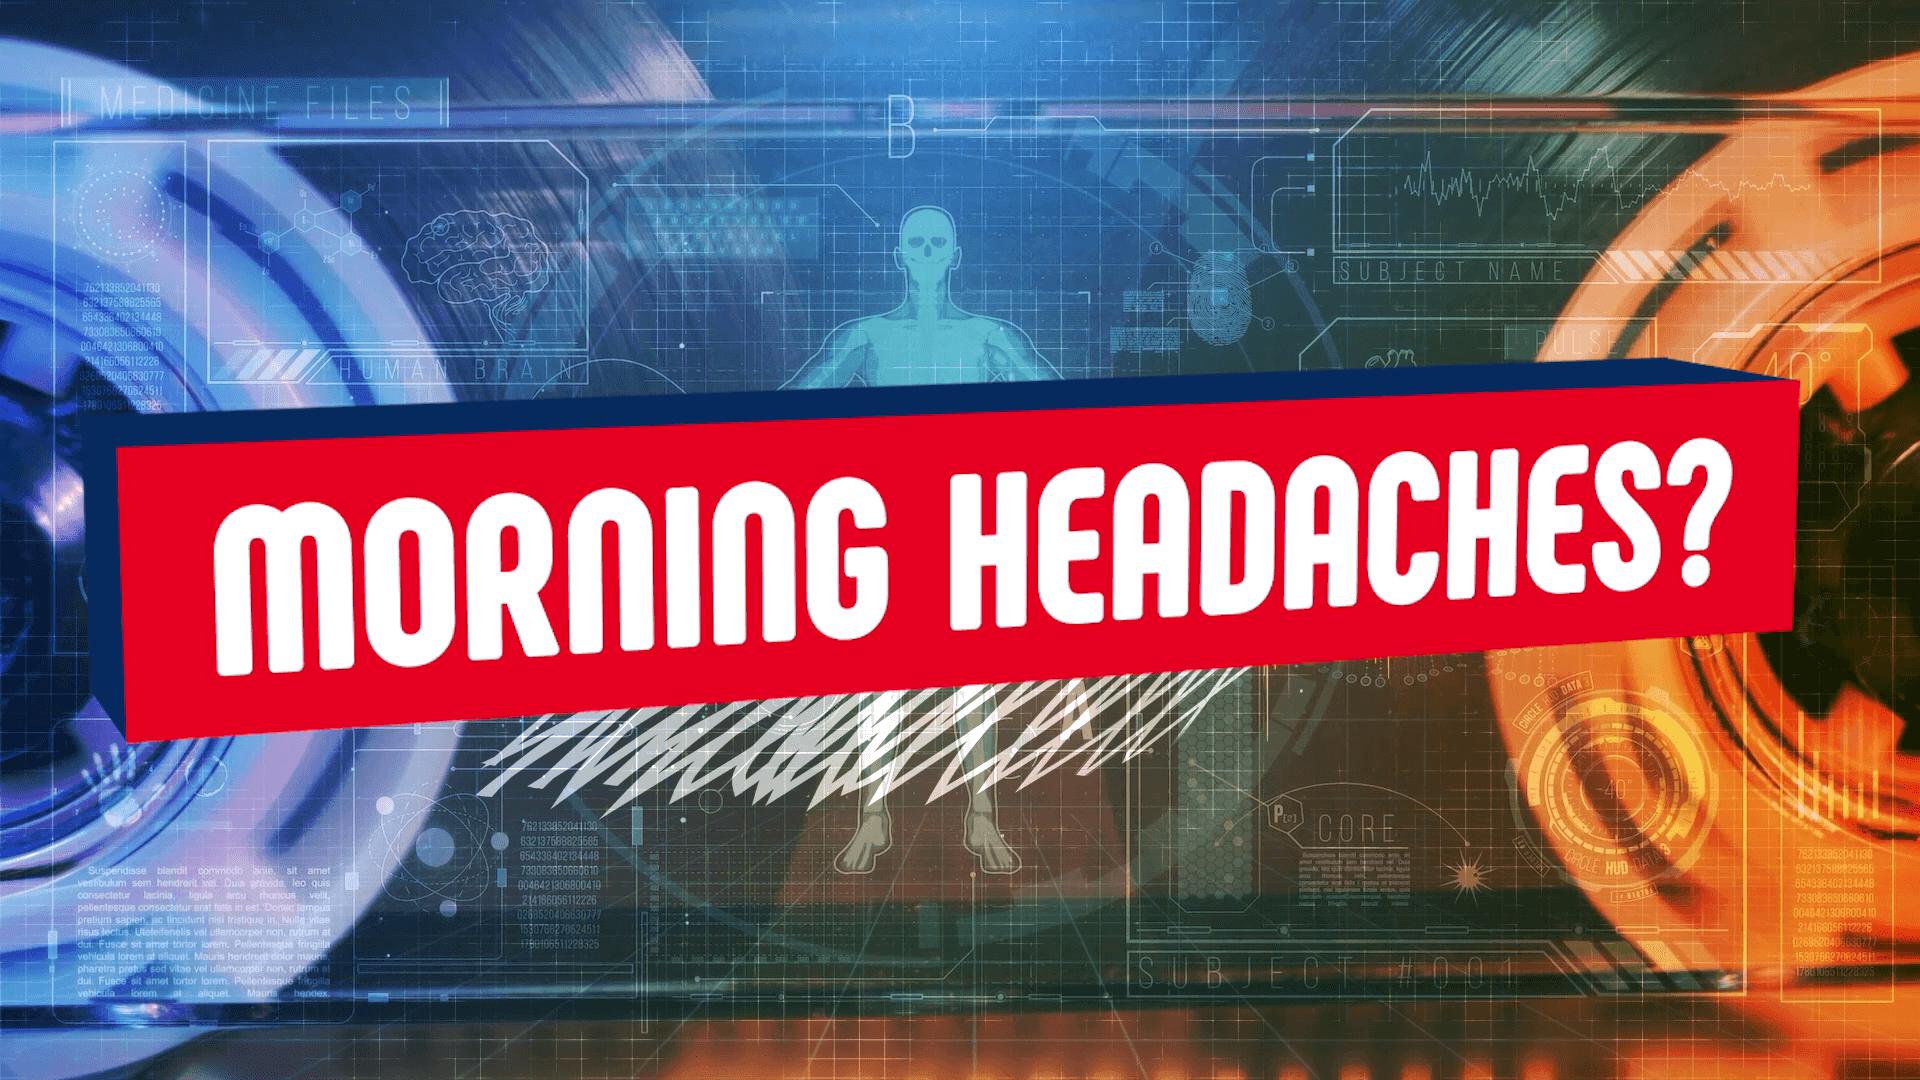 Morning headaches and sleep apnea